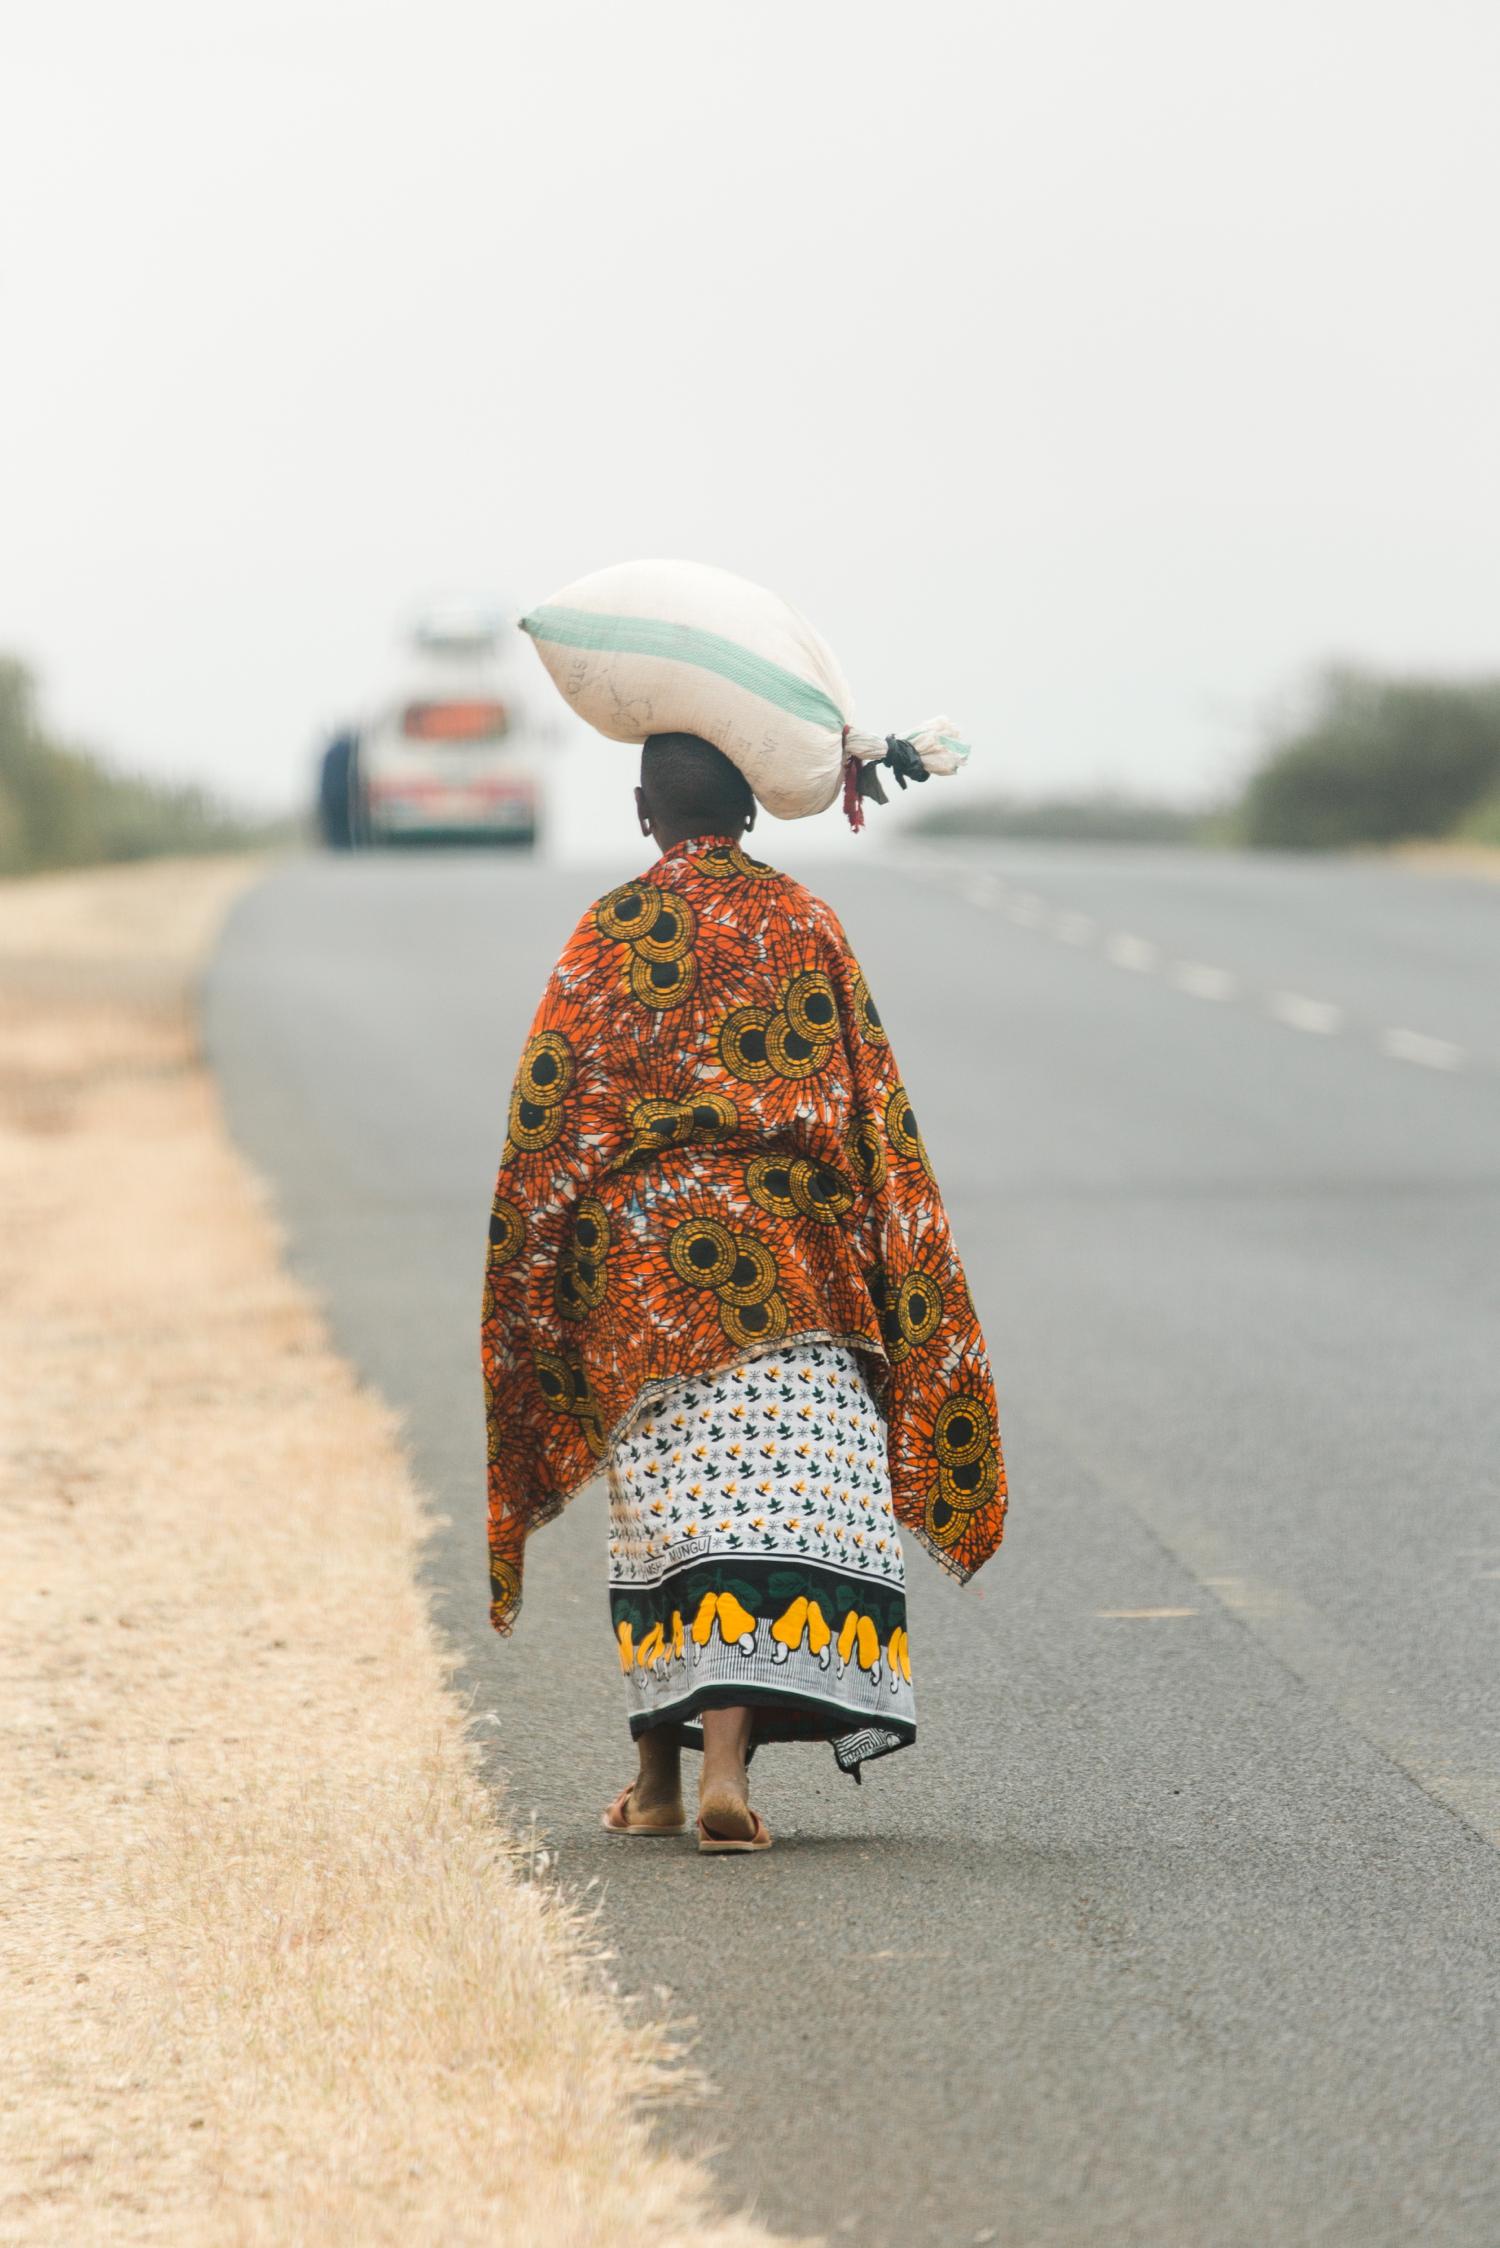 cameron-zegers-travel-photographer-magazine-tanzania.jpg